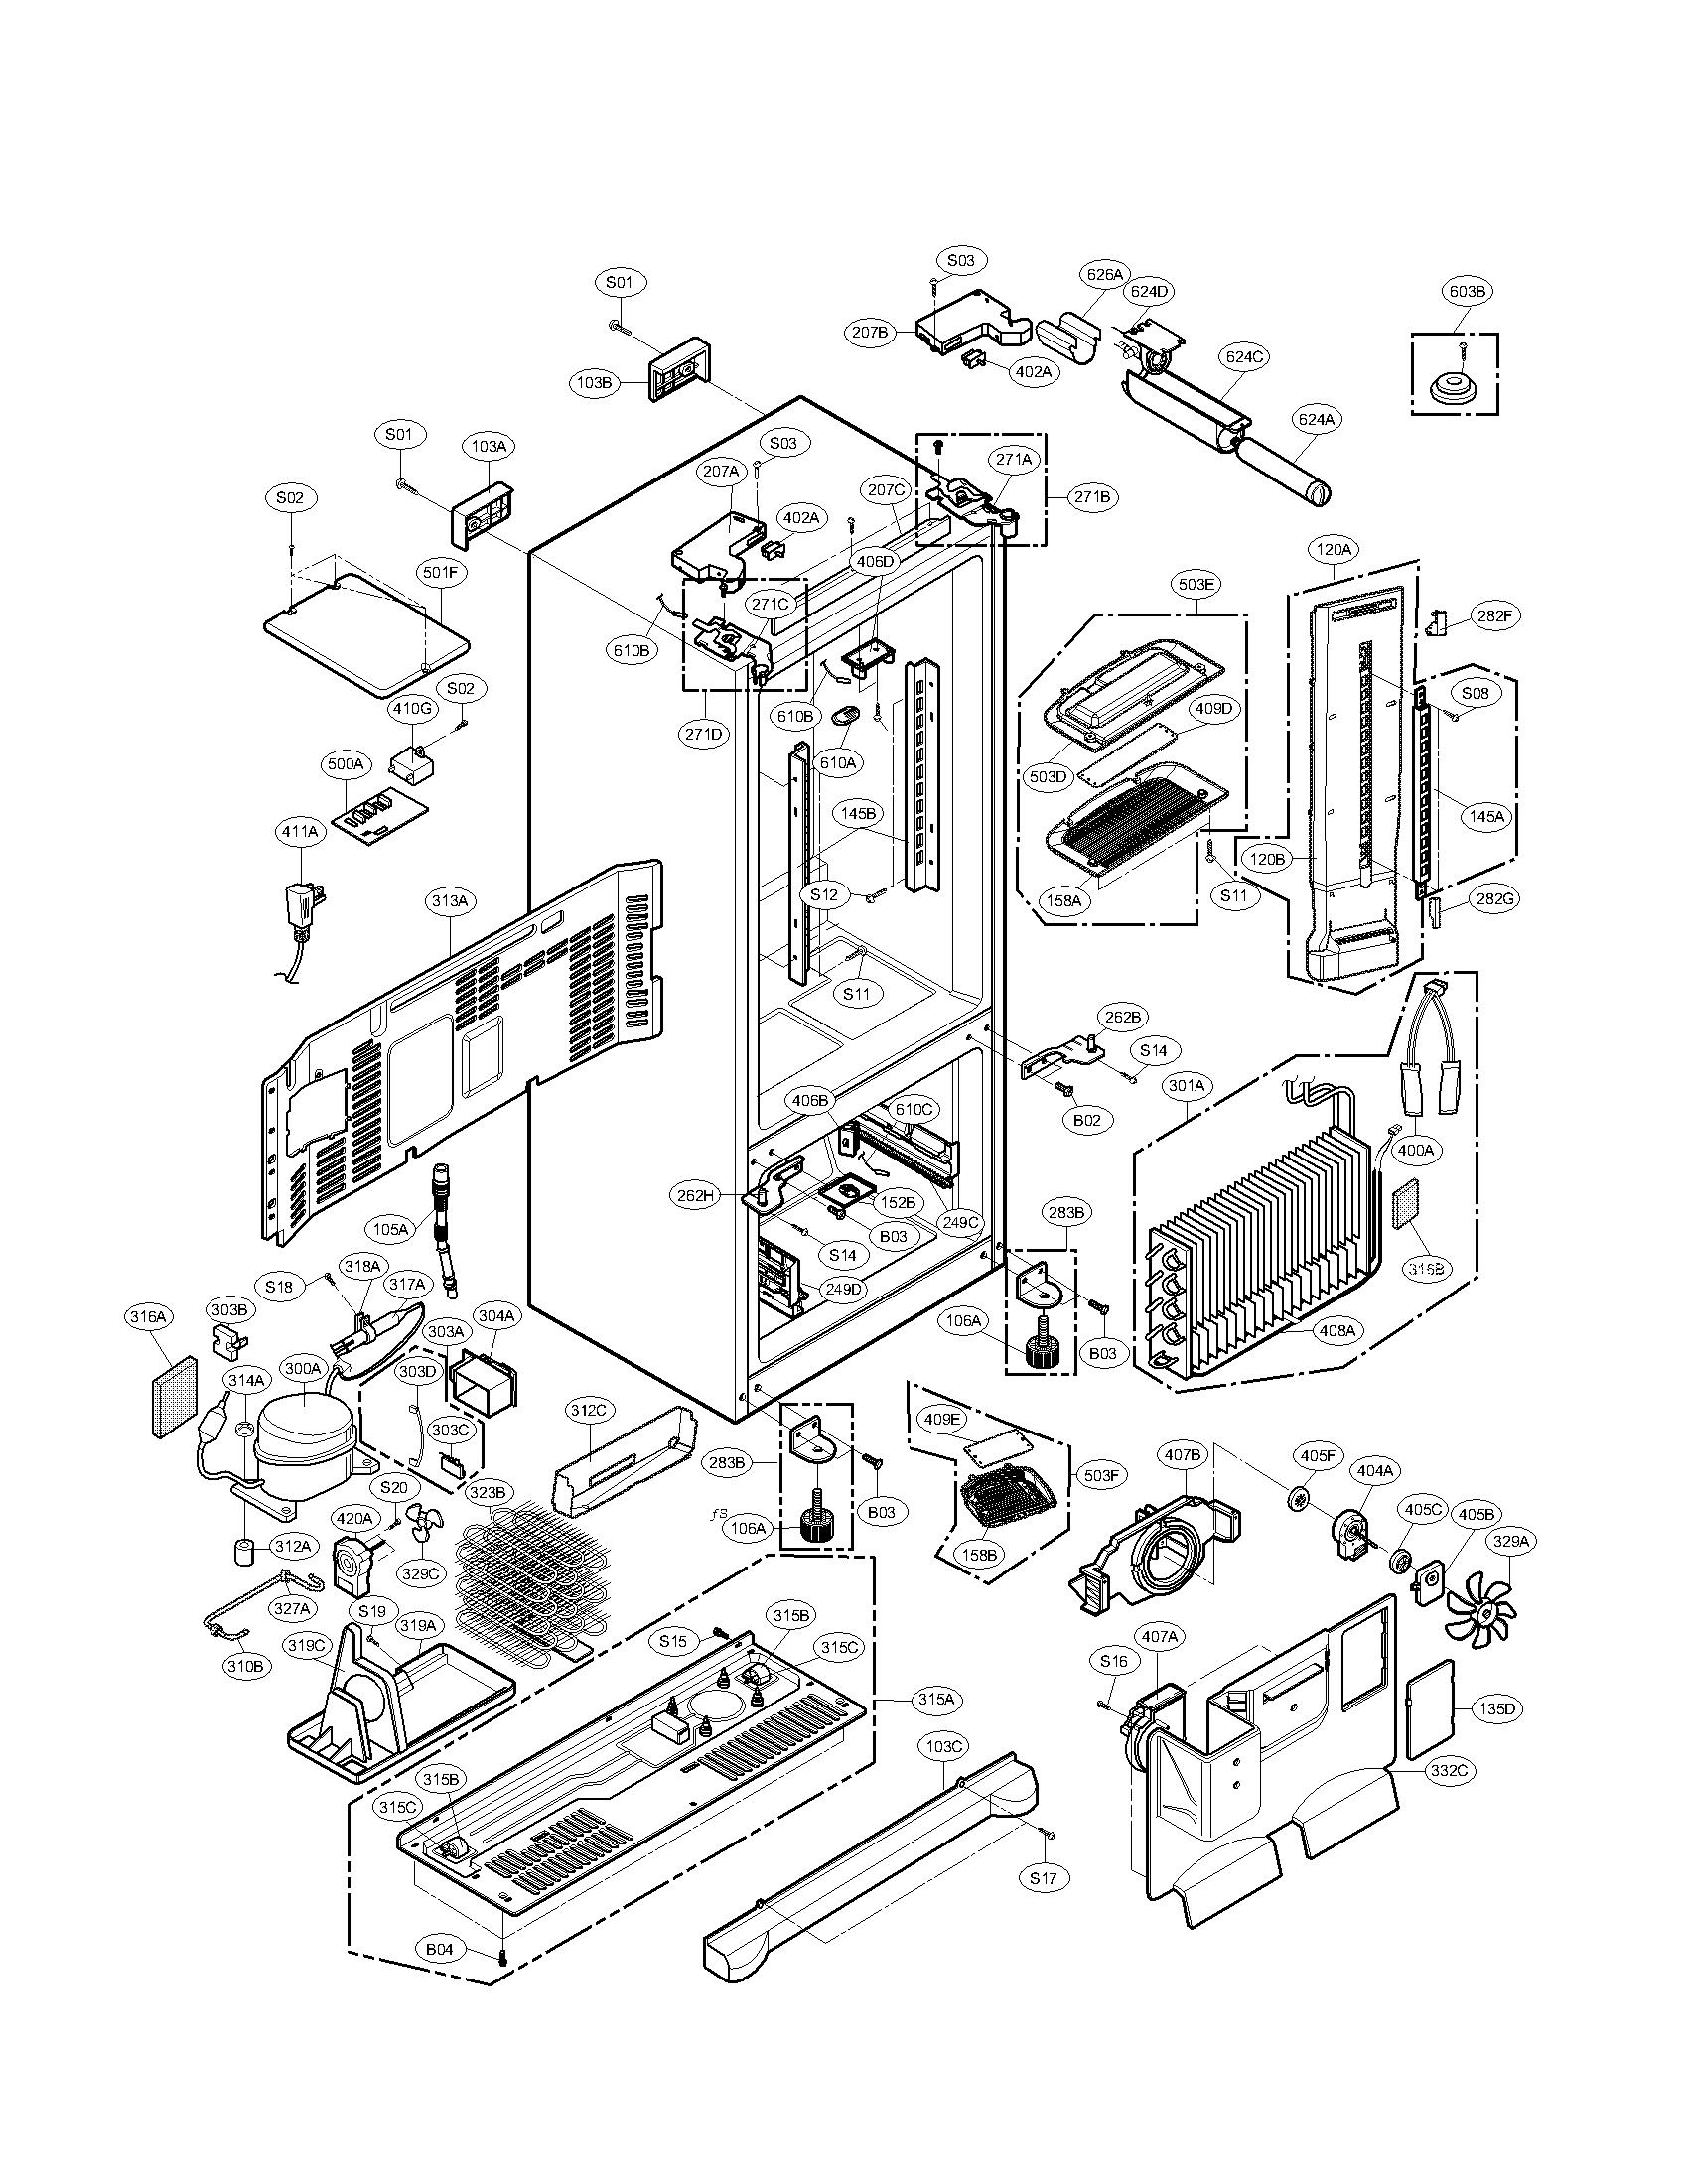 hight resolution of kenmore refrigerator schematic diagram wiring diagram general compressor wiring diagram kenmore refrigerator